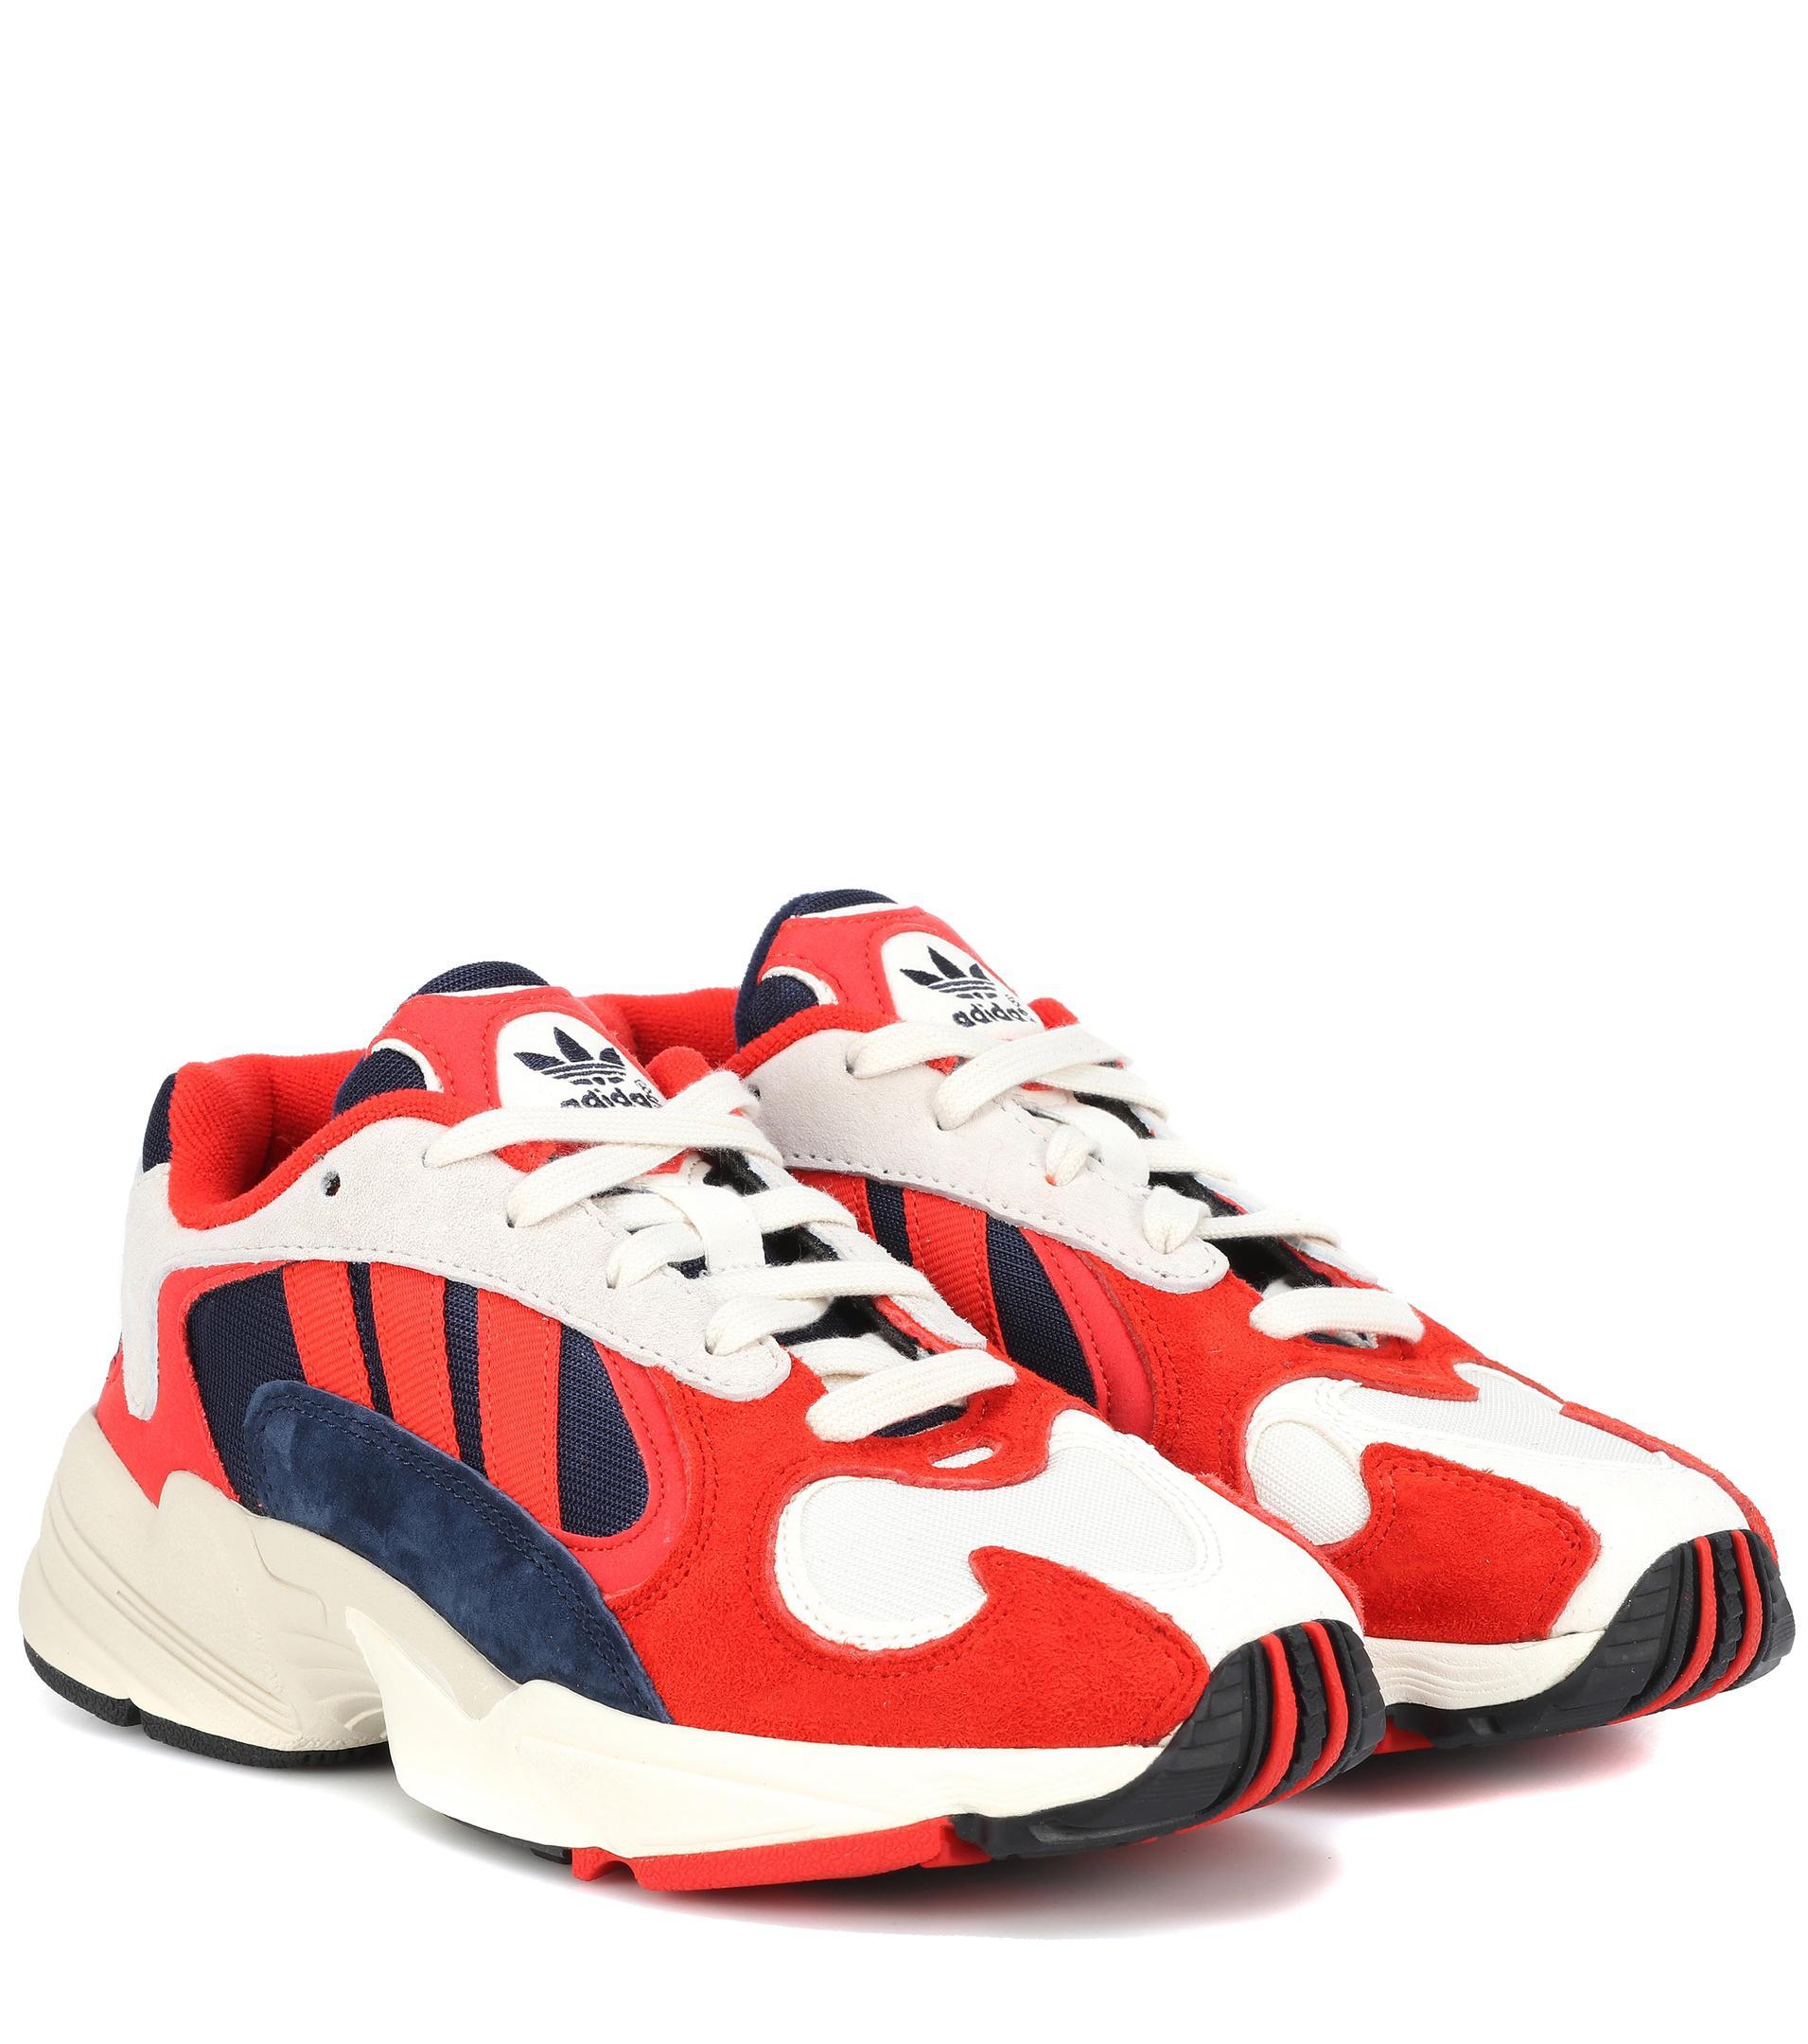 373430b92ba Lyst - adidas Originals Yung 1 Nubuck Sneakers in Red